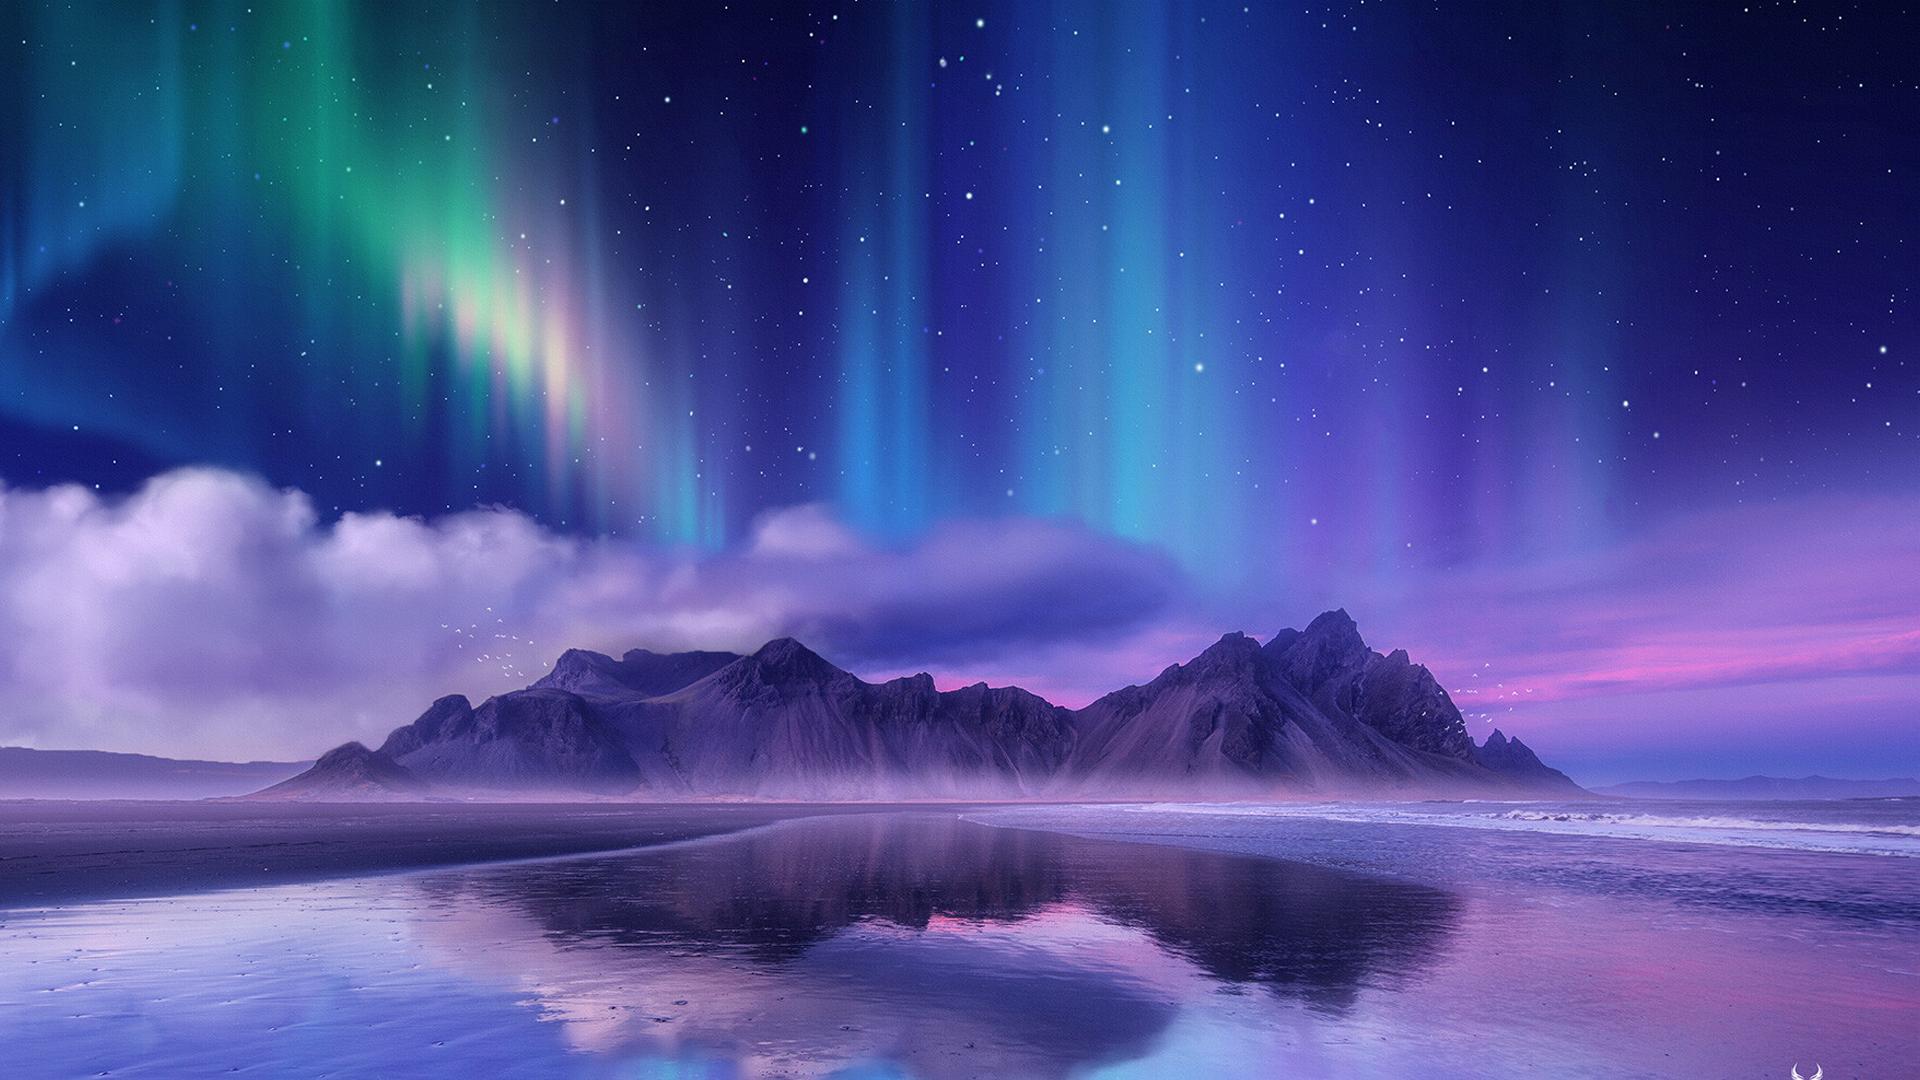 Aurora Borealis Near Sea Wallpaper, HD Nature 4K ...